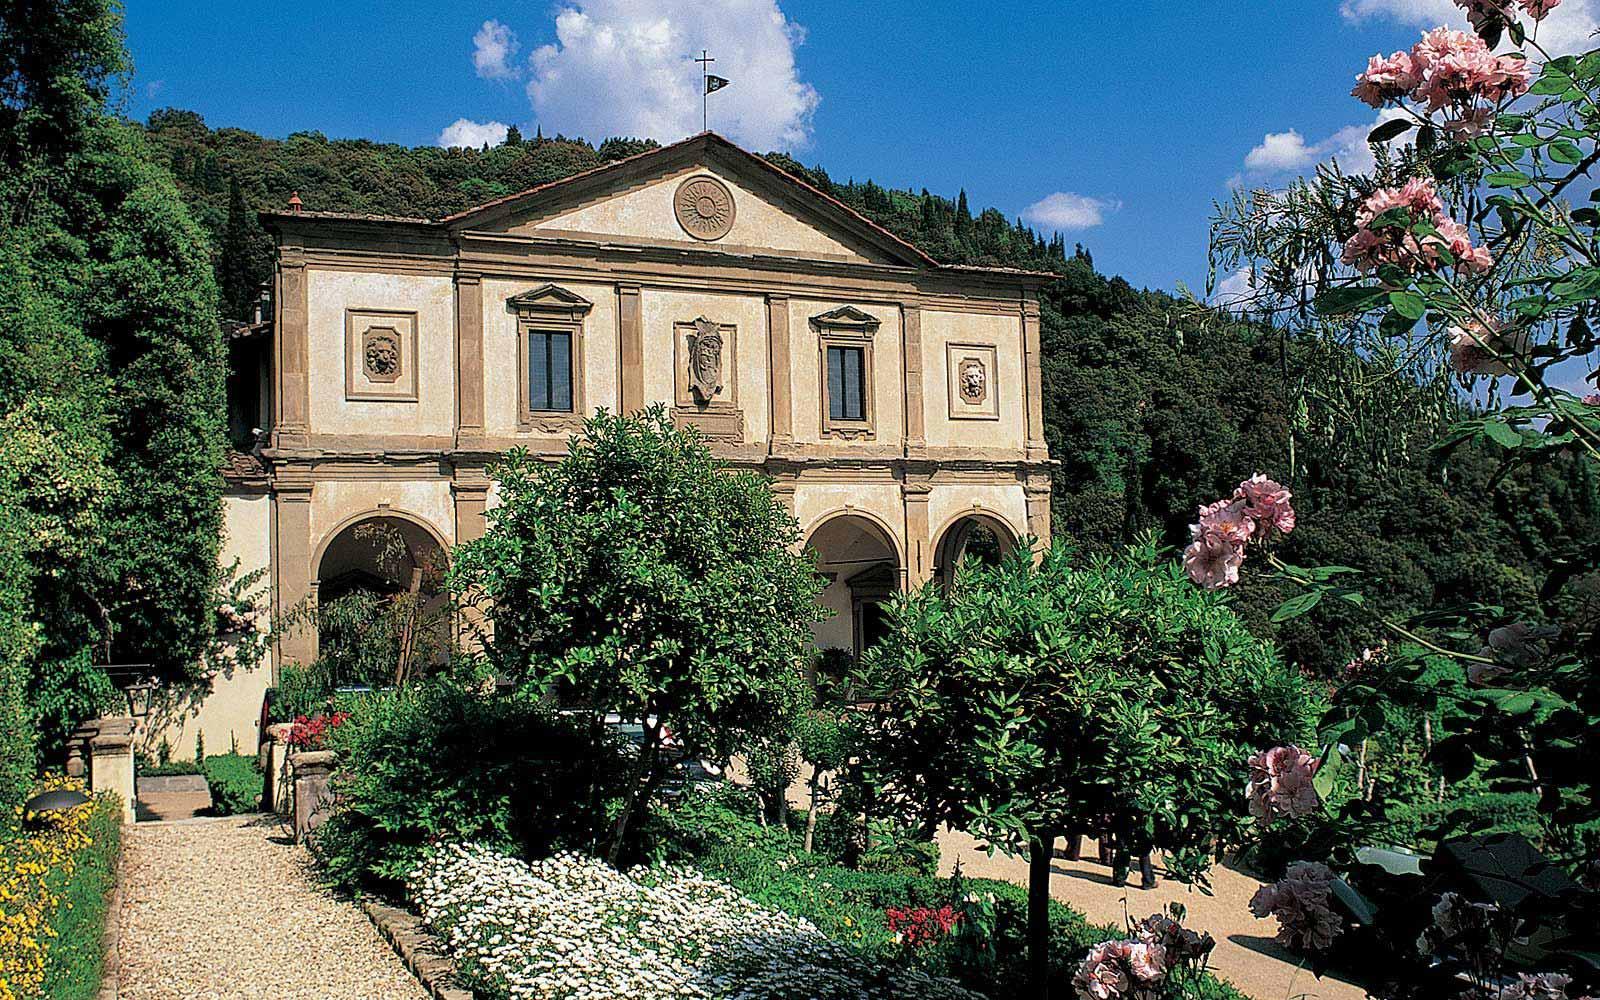 Grounds at Belmond Villa San Michele